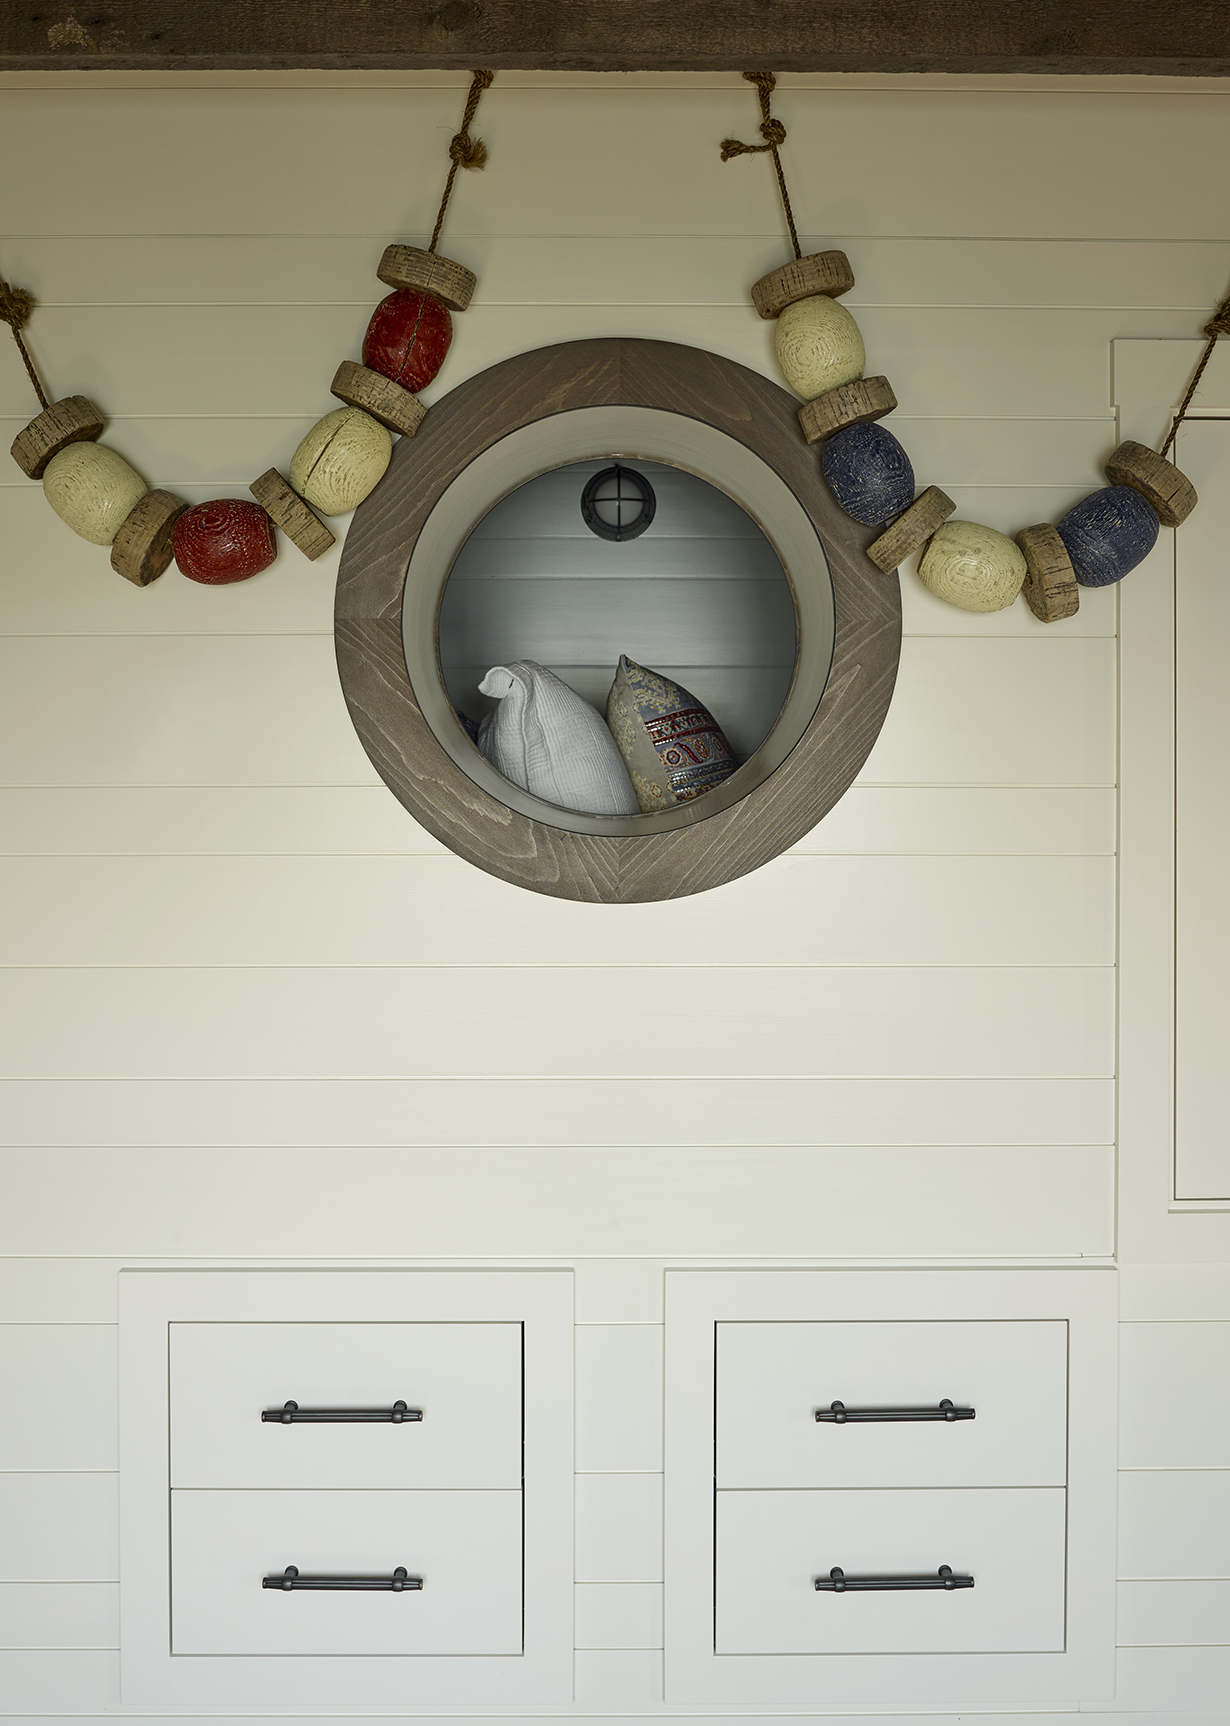 knickerbocker-group-project-maine-cottage-bunkhouse